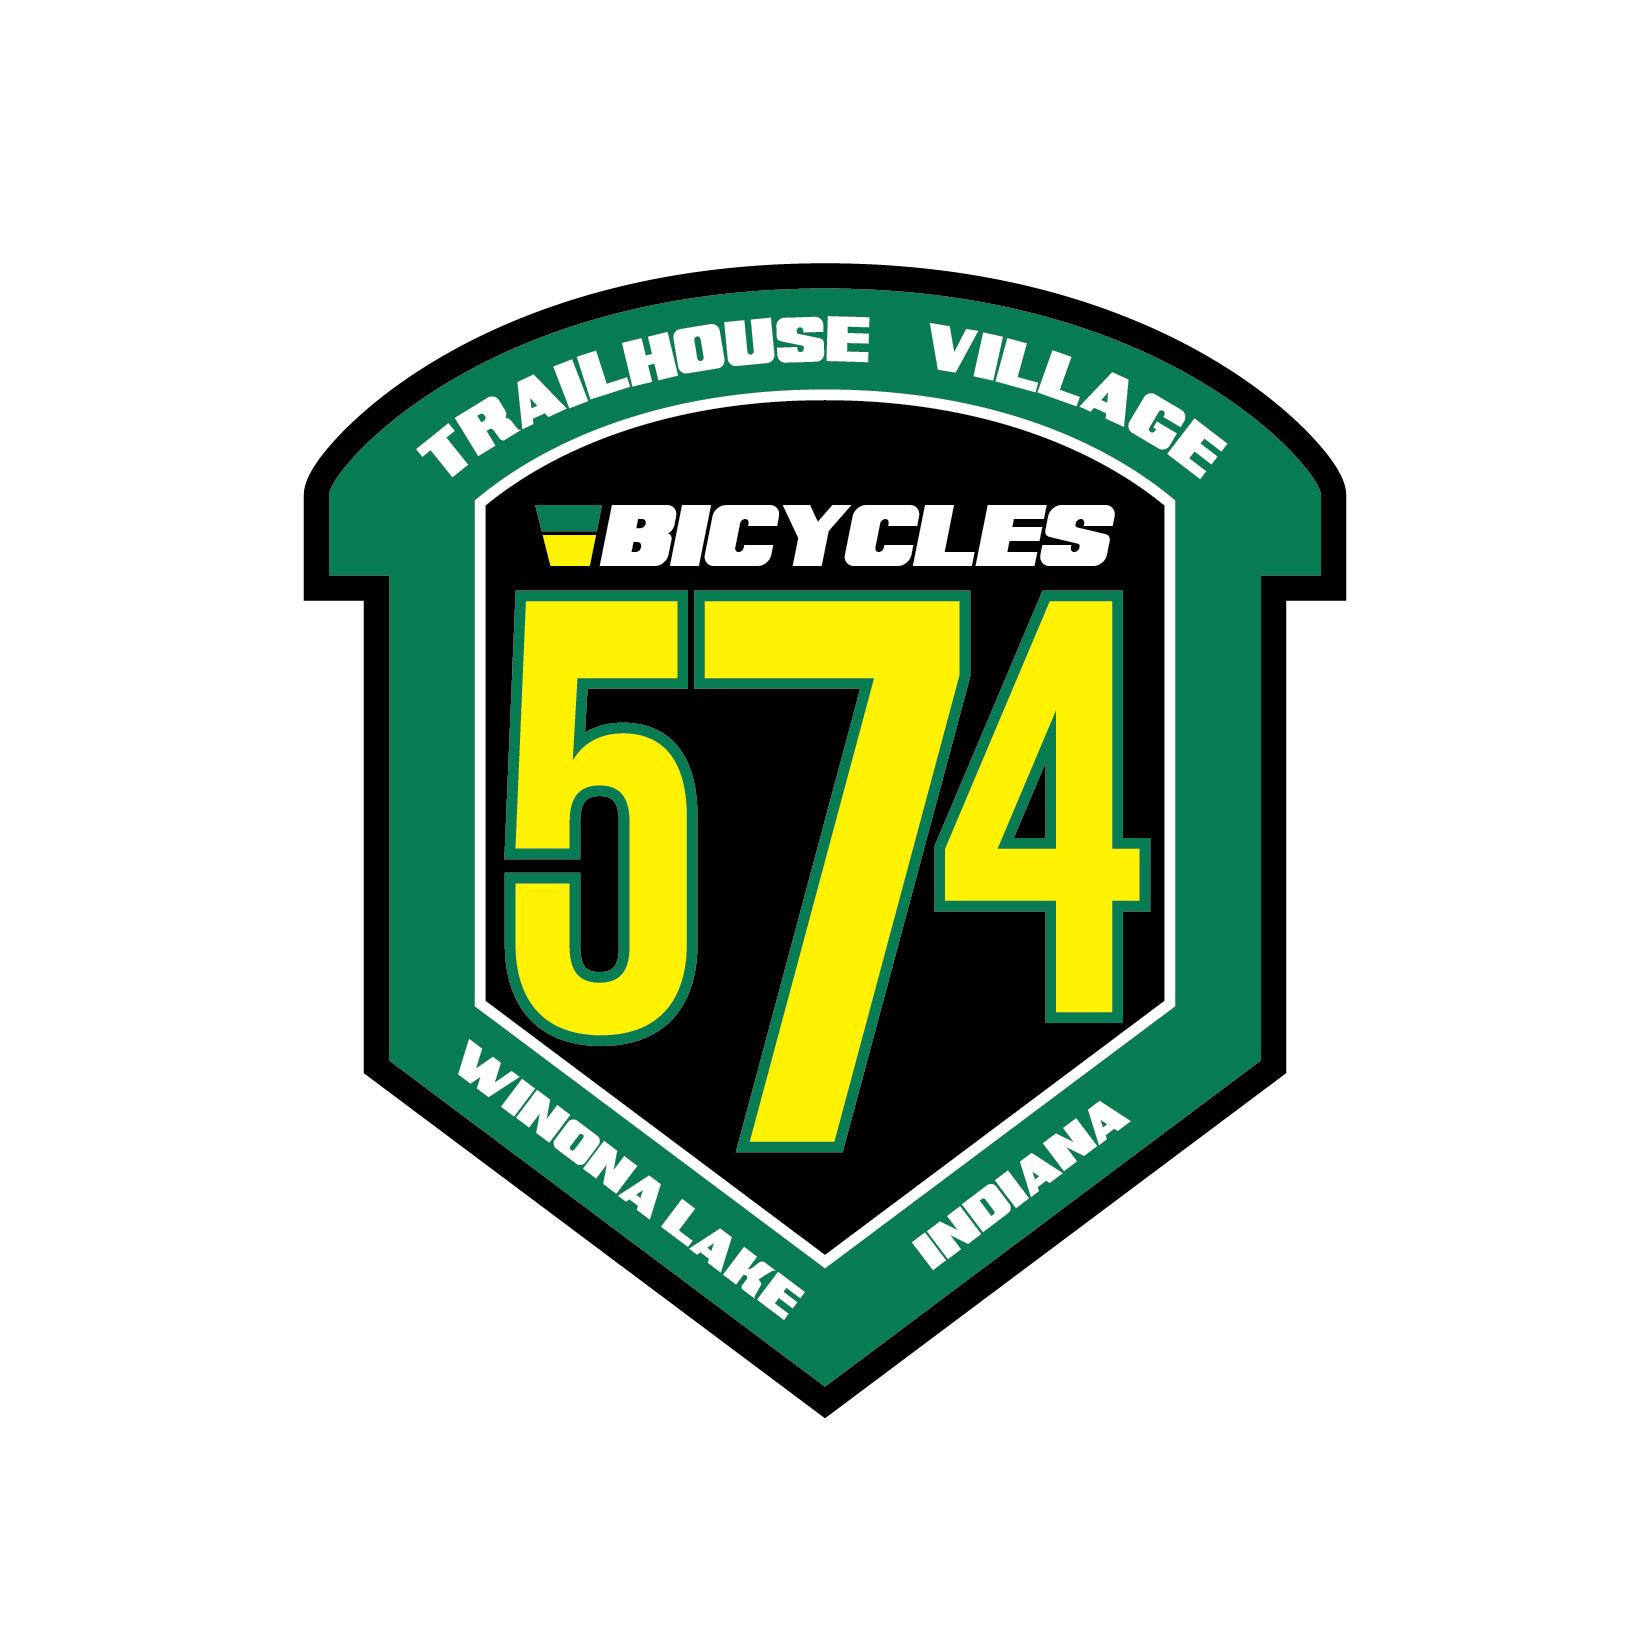 Trailhouse Bicycles Logo - HOME